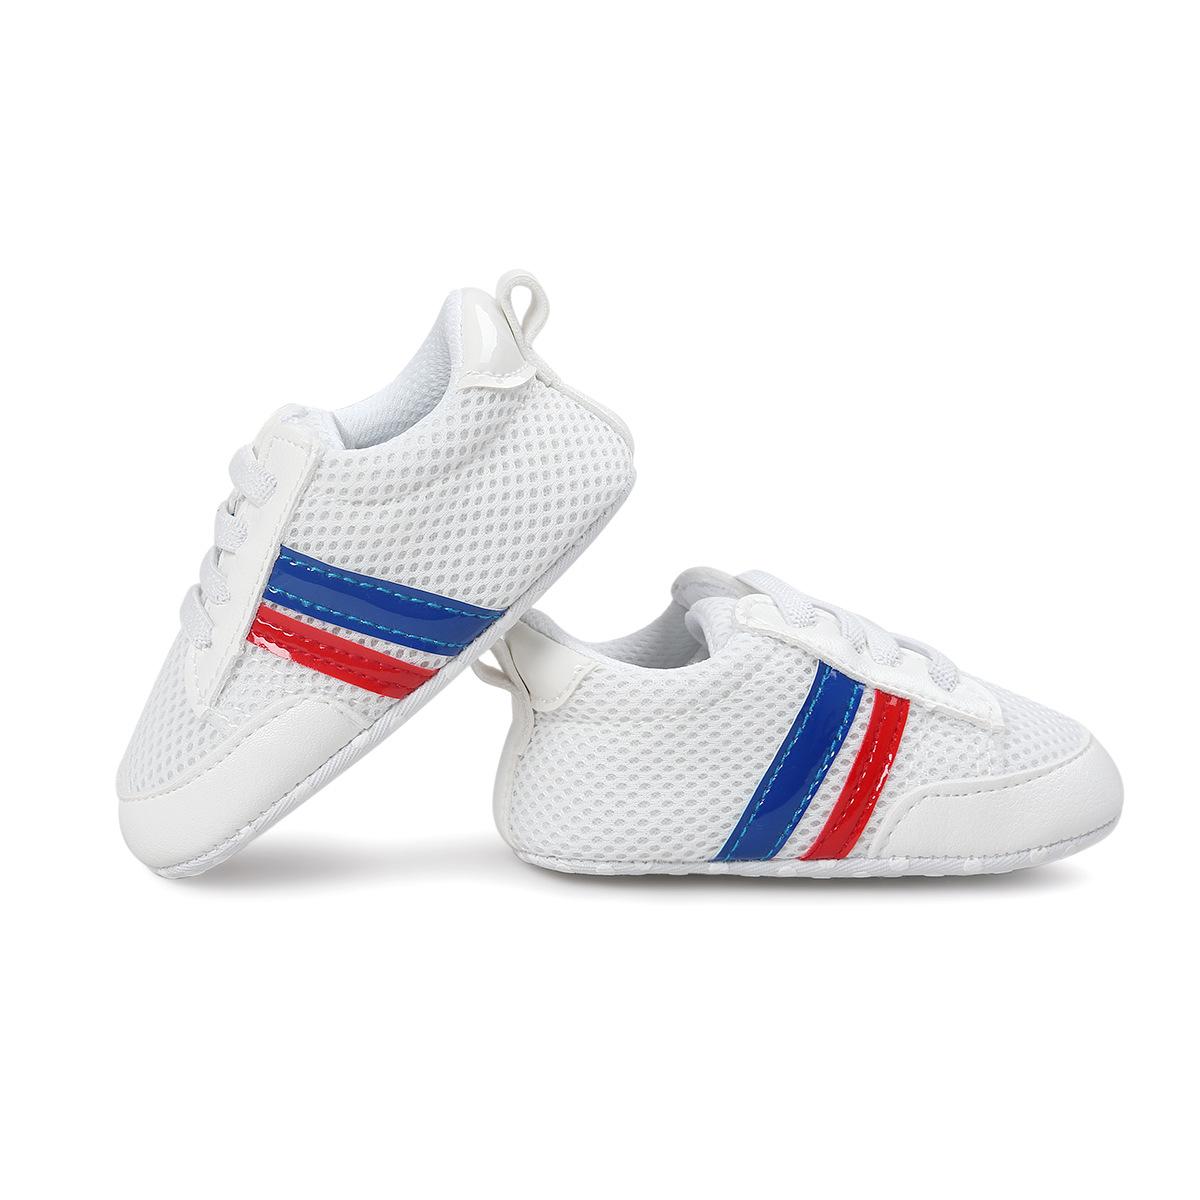 Pre-walker Baby Shoes รองเท้าเด็ก รองเท้าเด็กวัยหัดเดิน Romirus